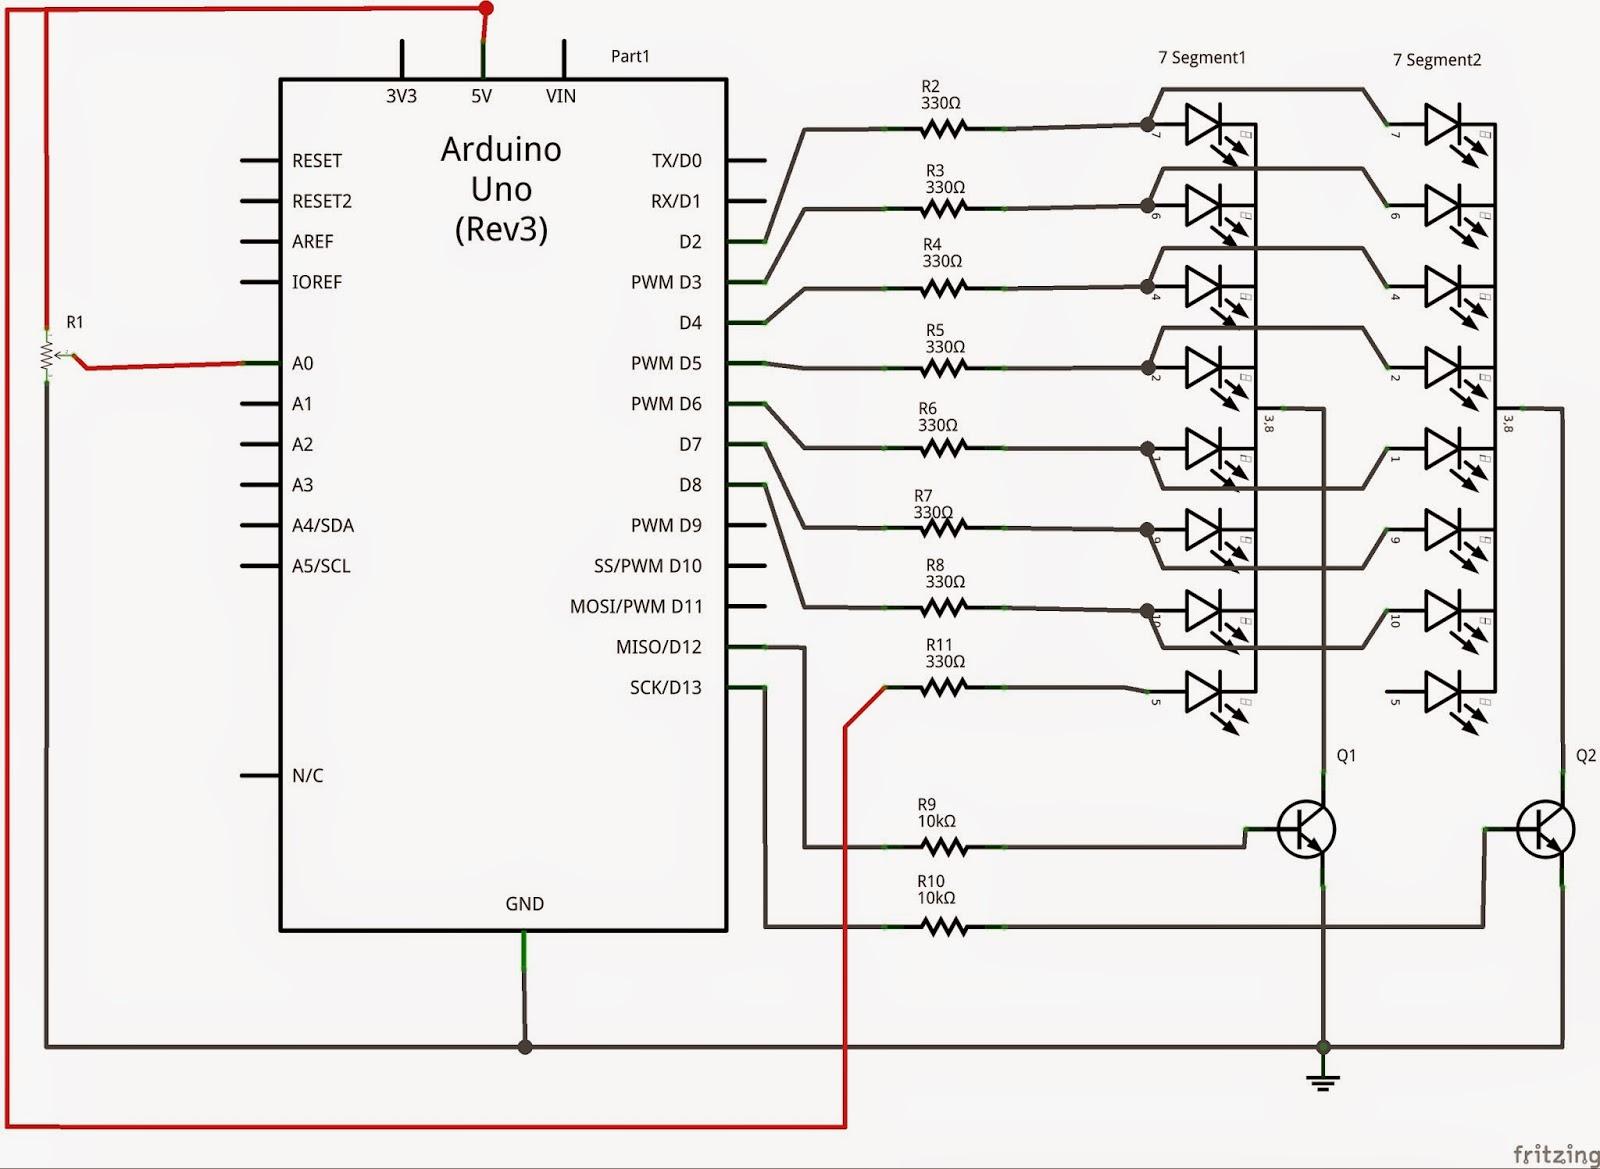 logic design of digital systems      u0e01 u0e32 u0e23 u0e17 u0e14 u0e25 u0e2d u0e07 u0e17 u0e35 u0e48 4 6  u0e01 u0e32 u0e23